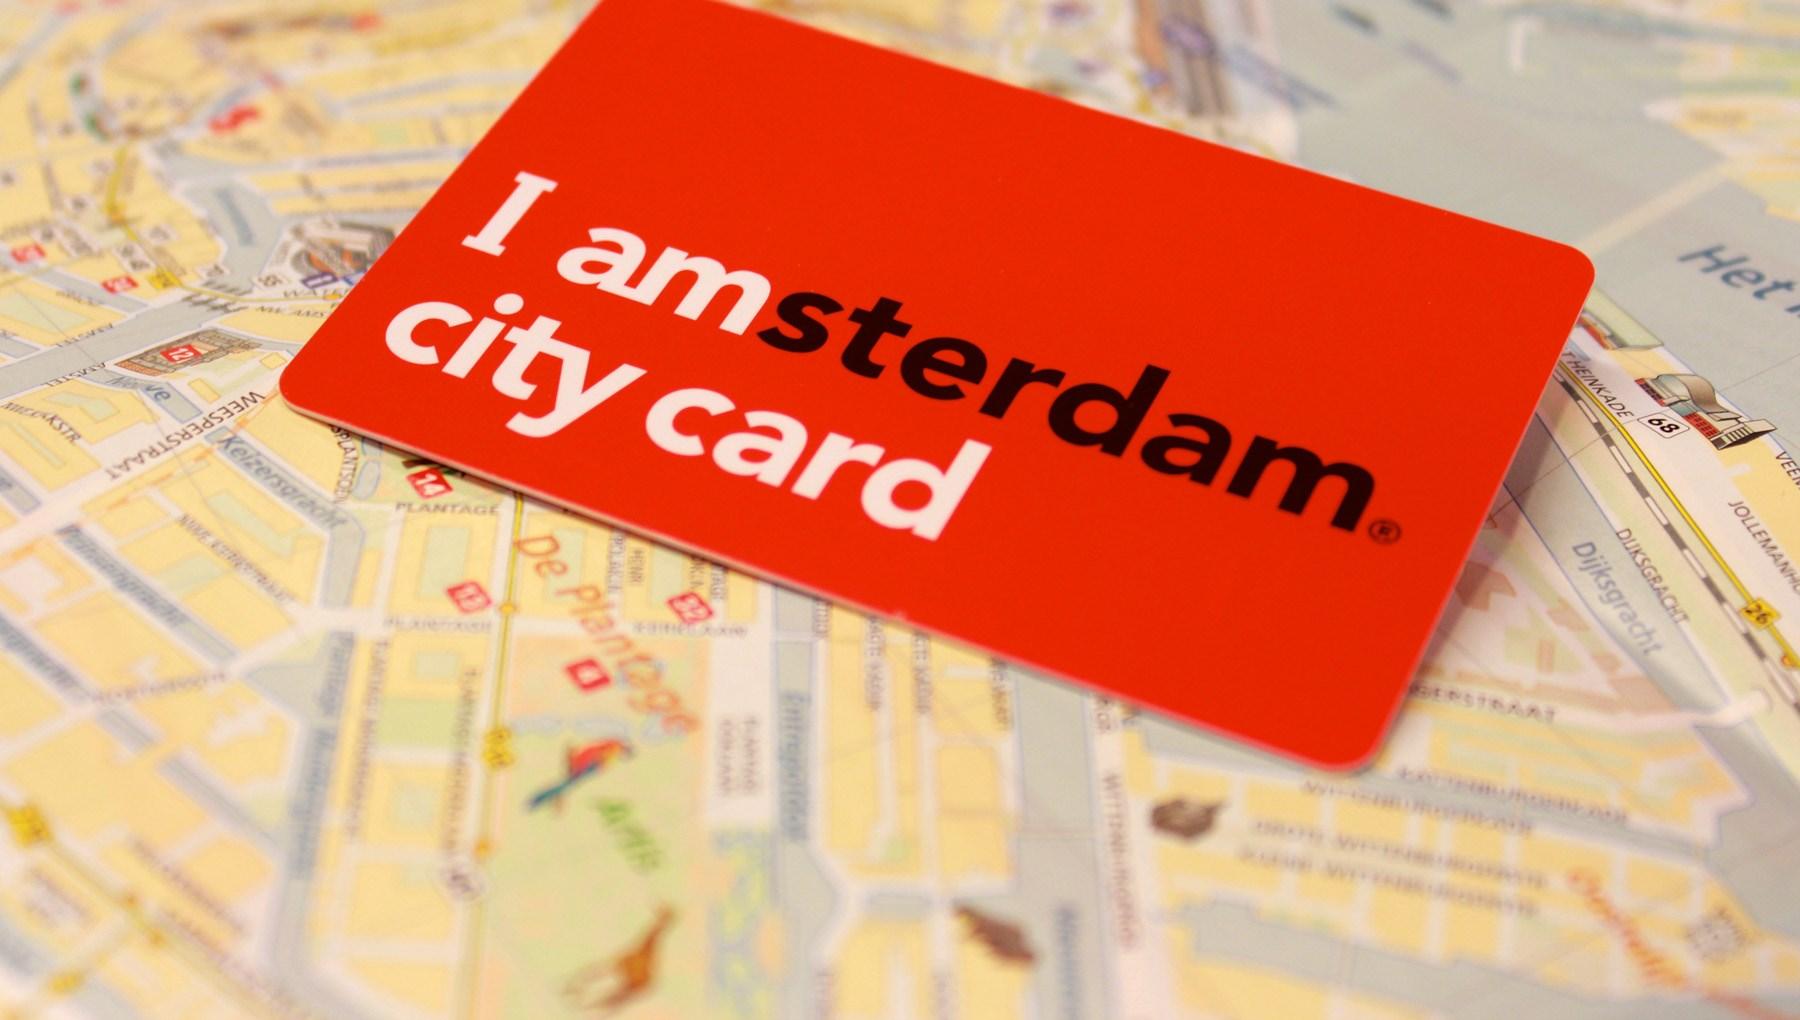 i-amsterdam-city-cardbewerkt